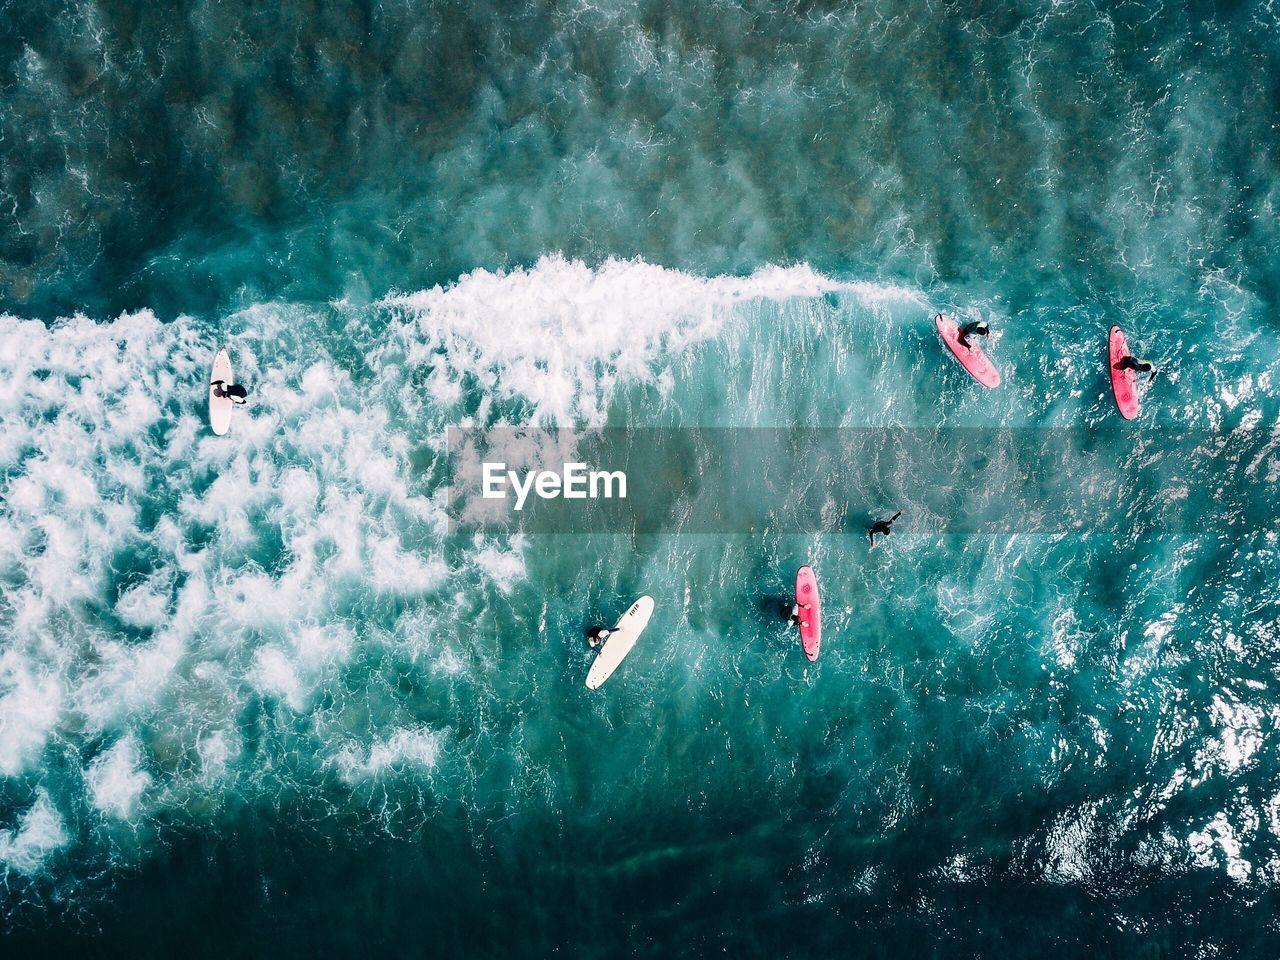 Aerial view of people surfboarding on sea